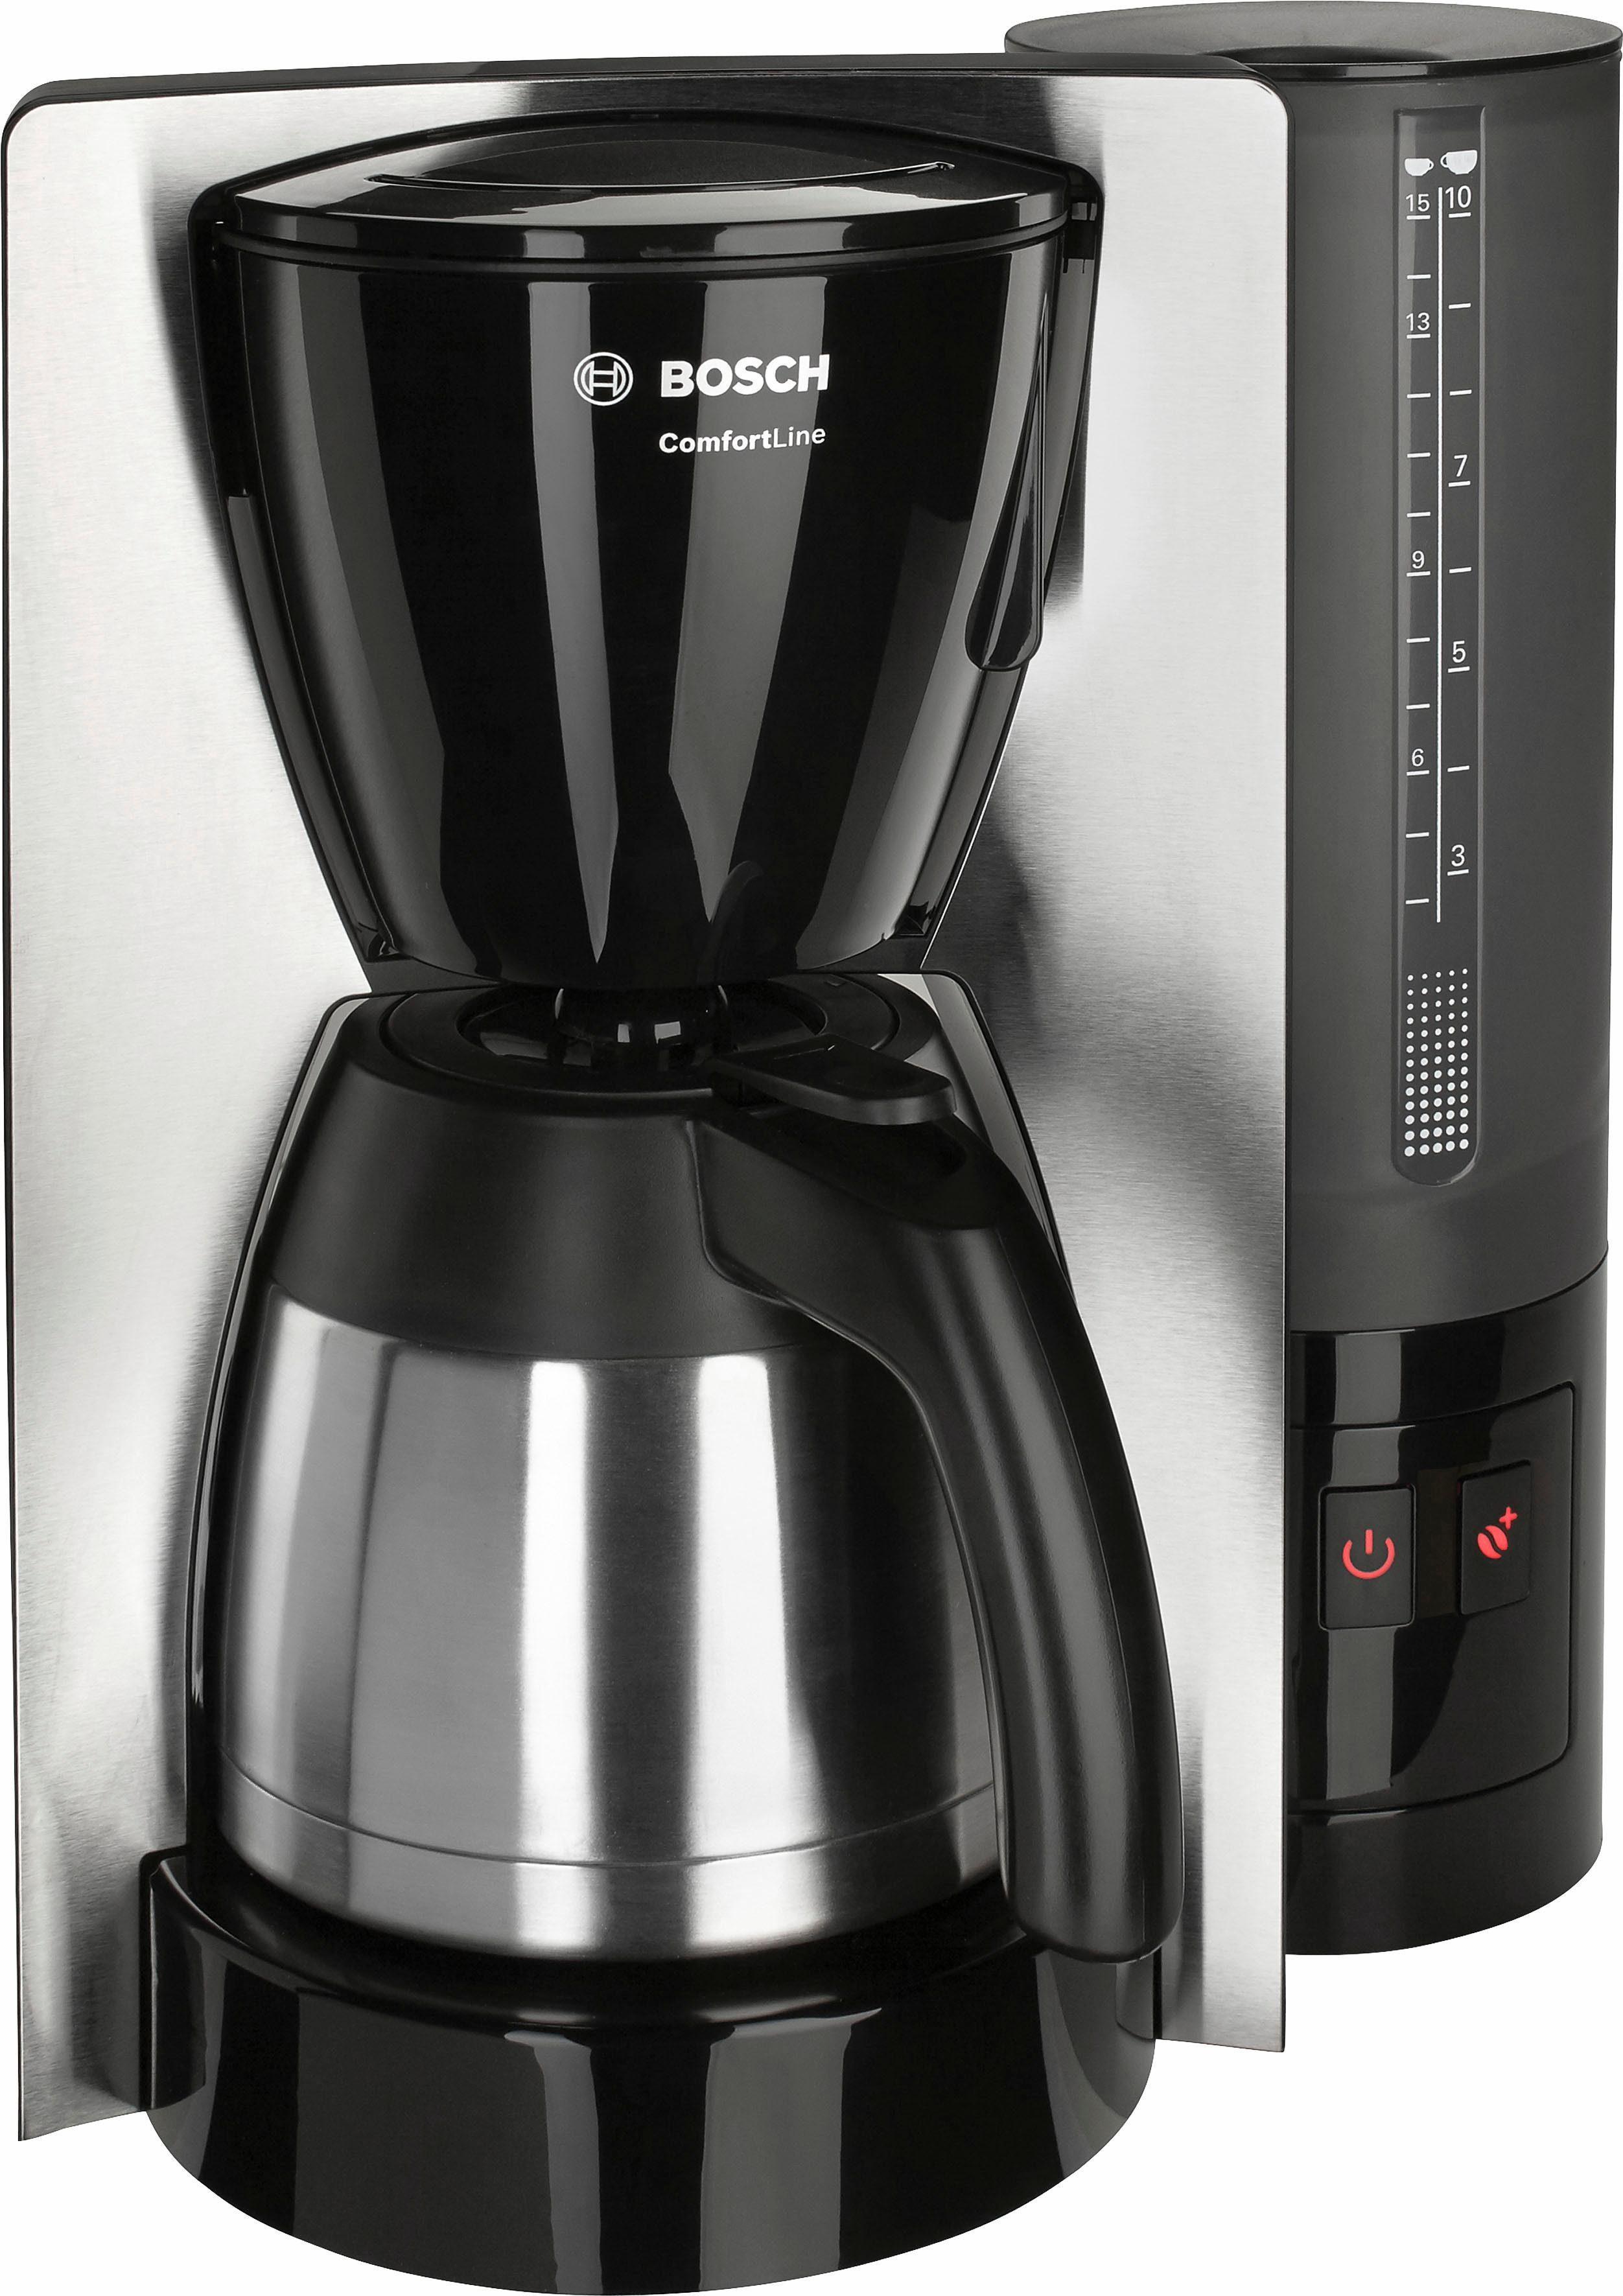 Bosch Thermo-Filterkaffeemaschine ComfortLine TKA6A683, 1,15 Liter